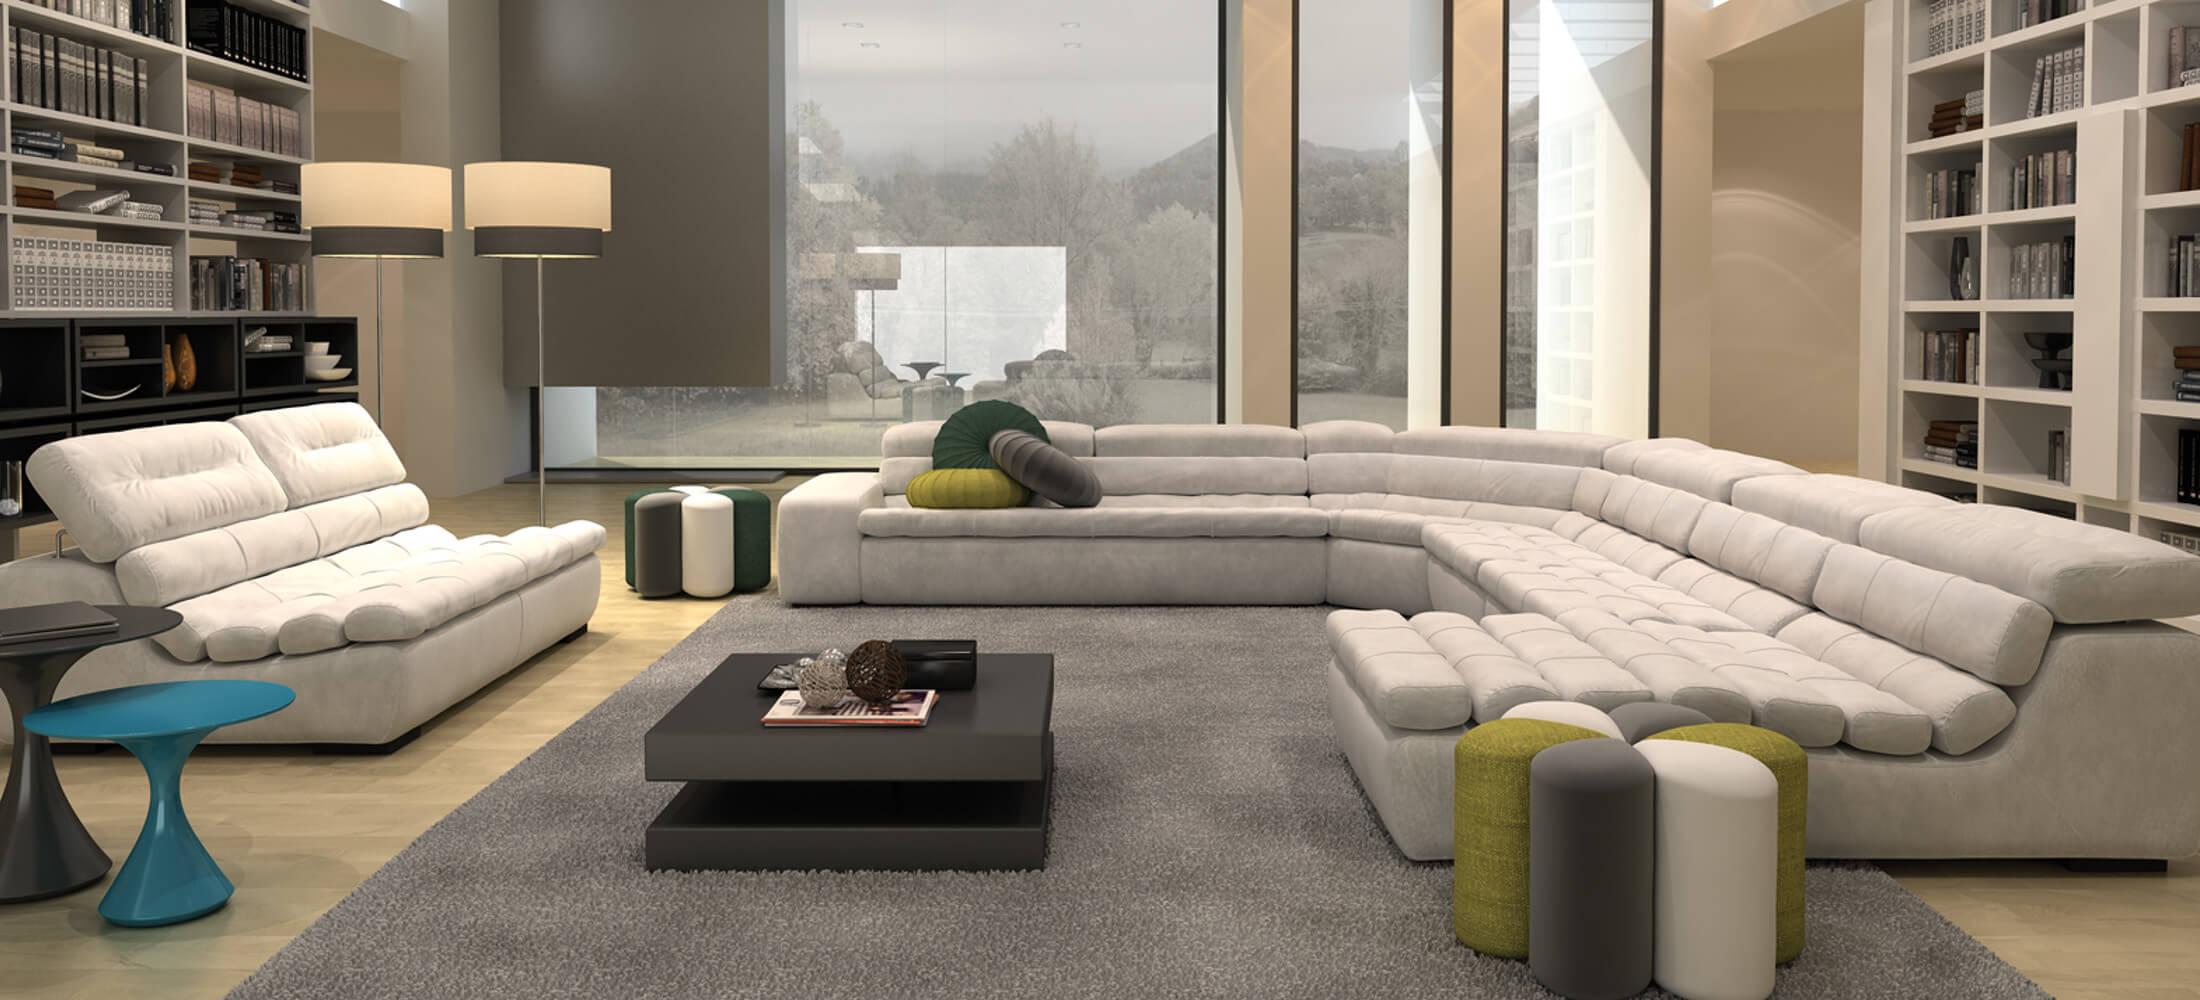 Ambiente sofá rinconera Kobe